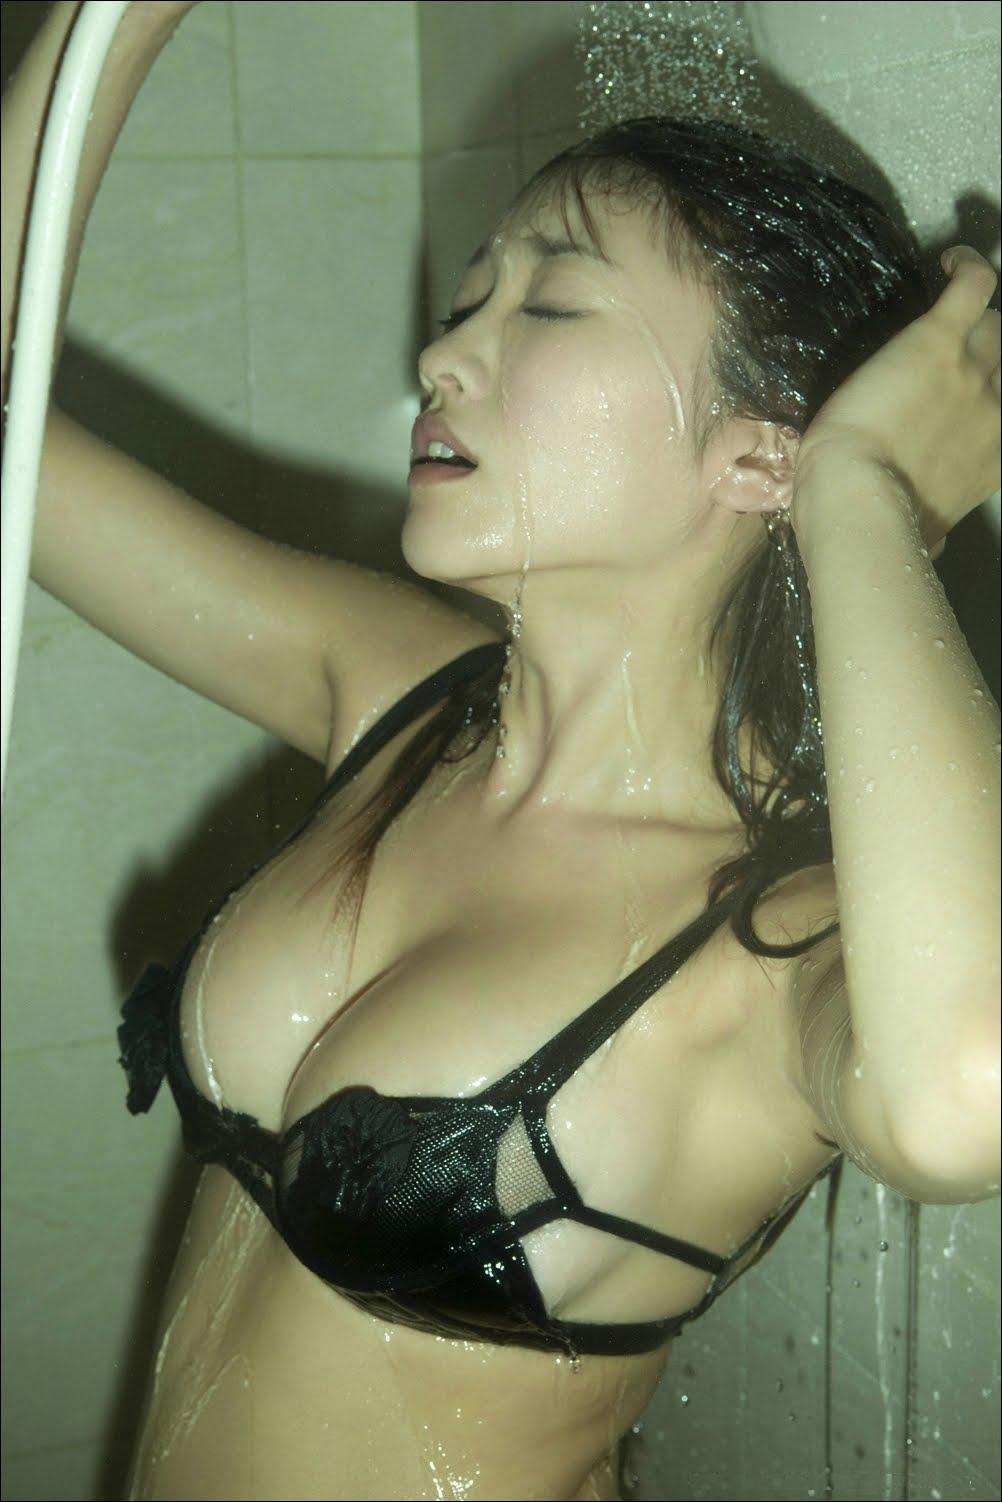 http://3.bp.blogspot.com/-XCKE97N_018/Ths7AmZZQGI/AAAAAAAAAgM/-QF2gdFxjUk/s1600/ShowerPan1.jpg